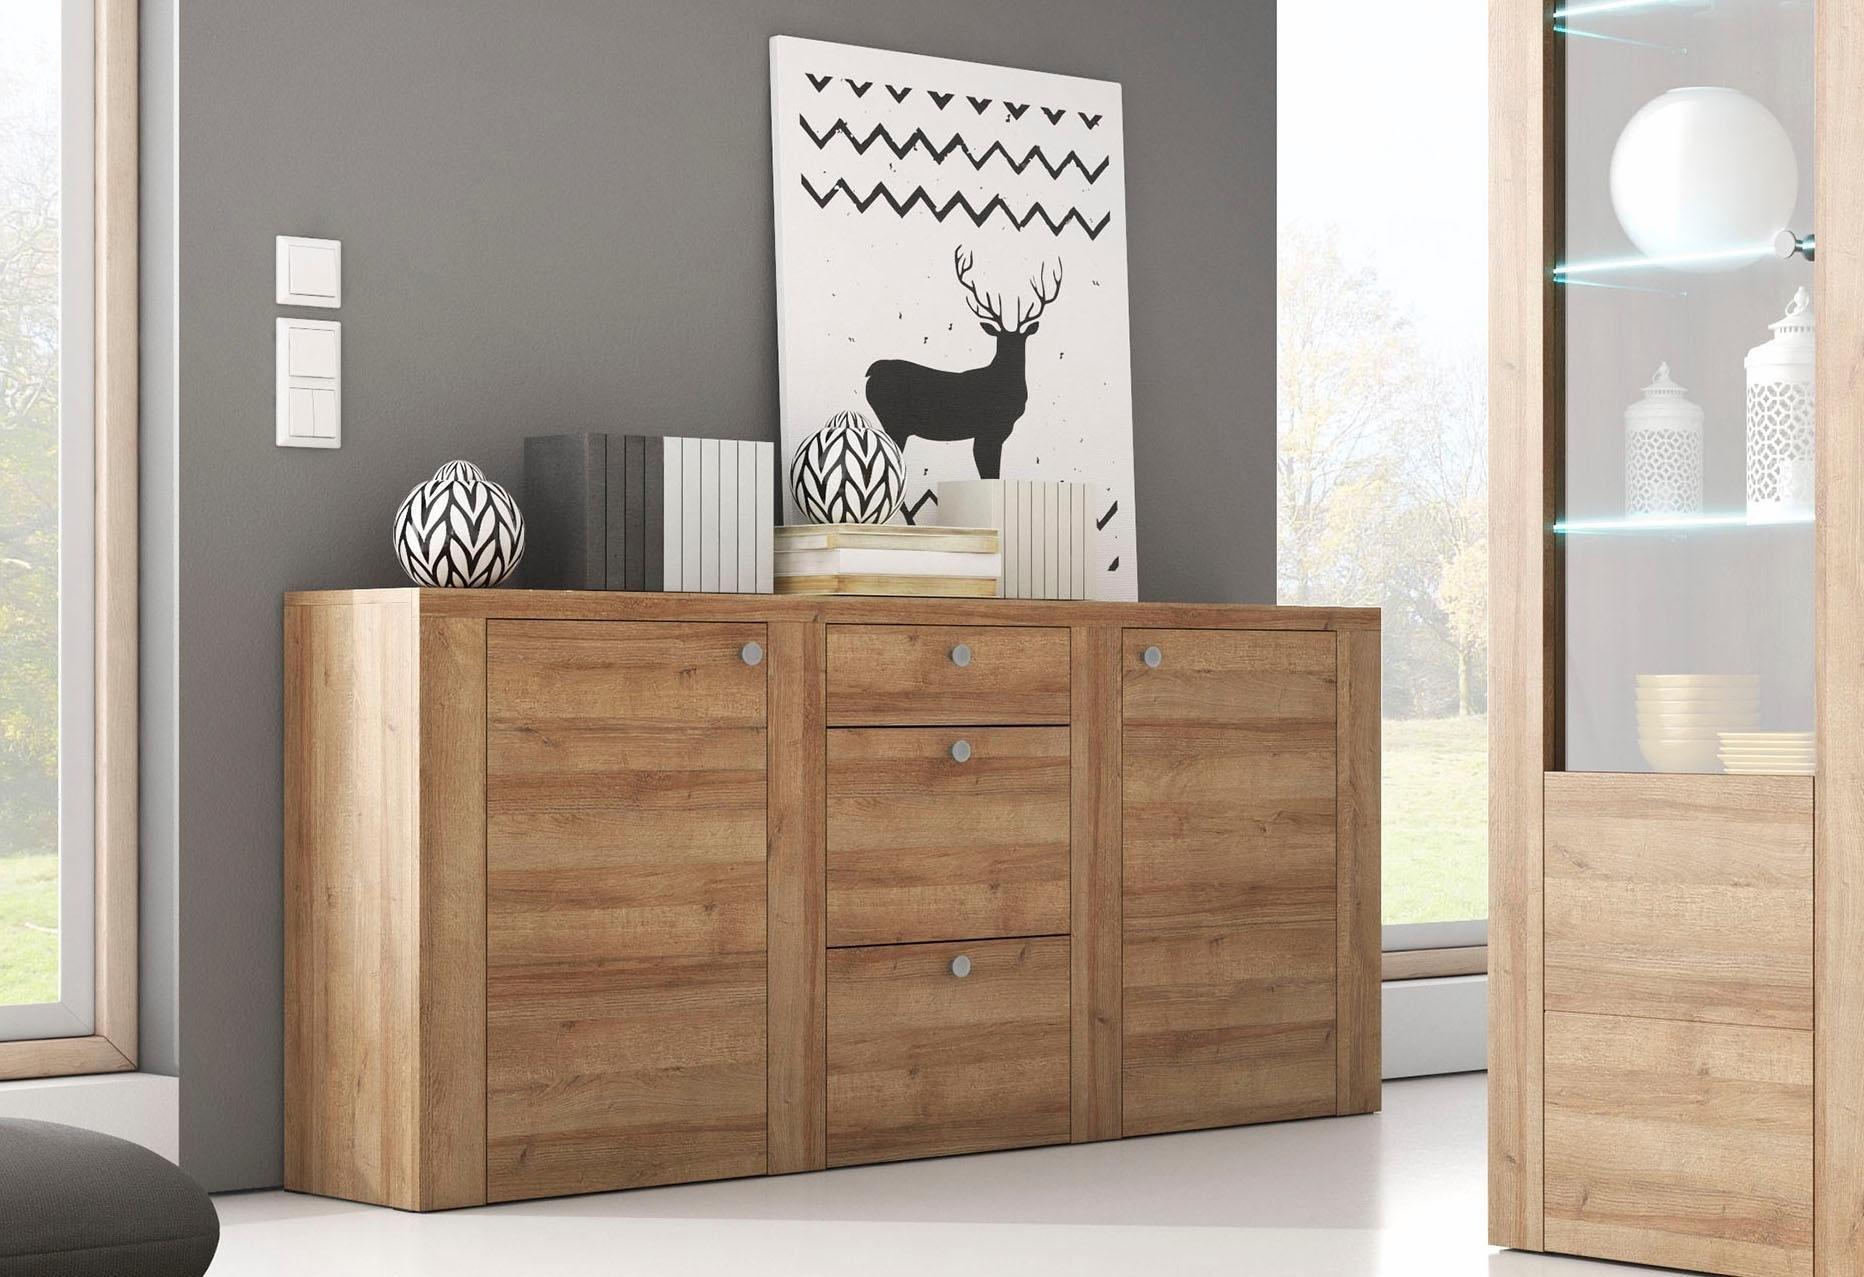 Latest breedte cm tecnos dressoir real breedte cm for Sideboard 3 meter lang